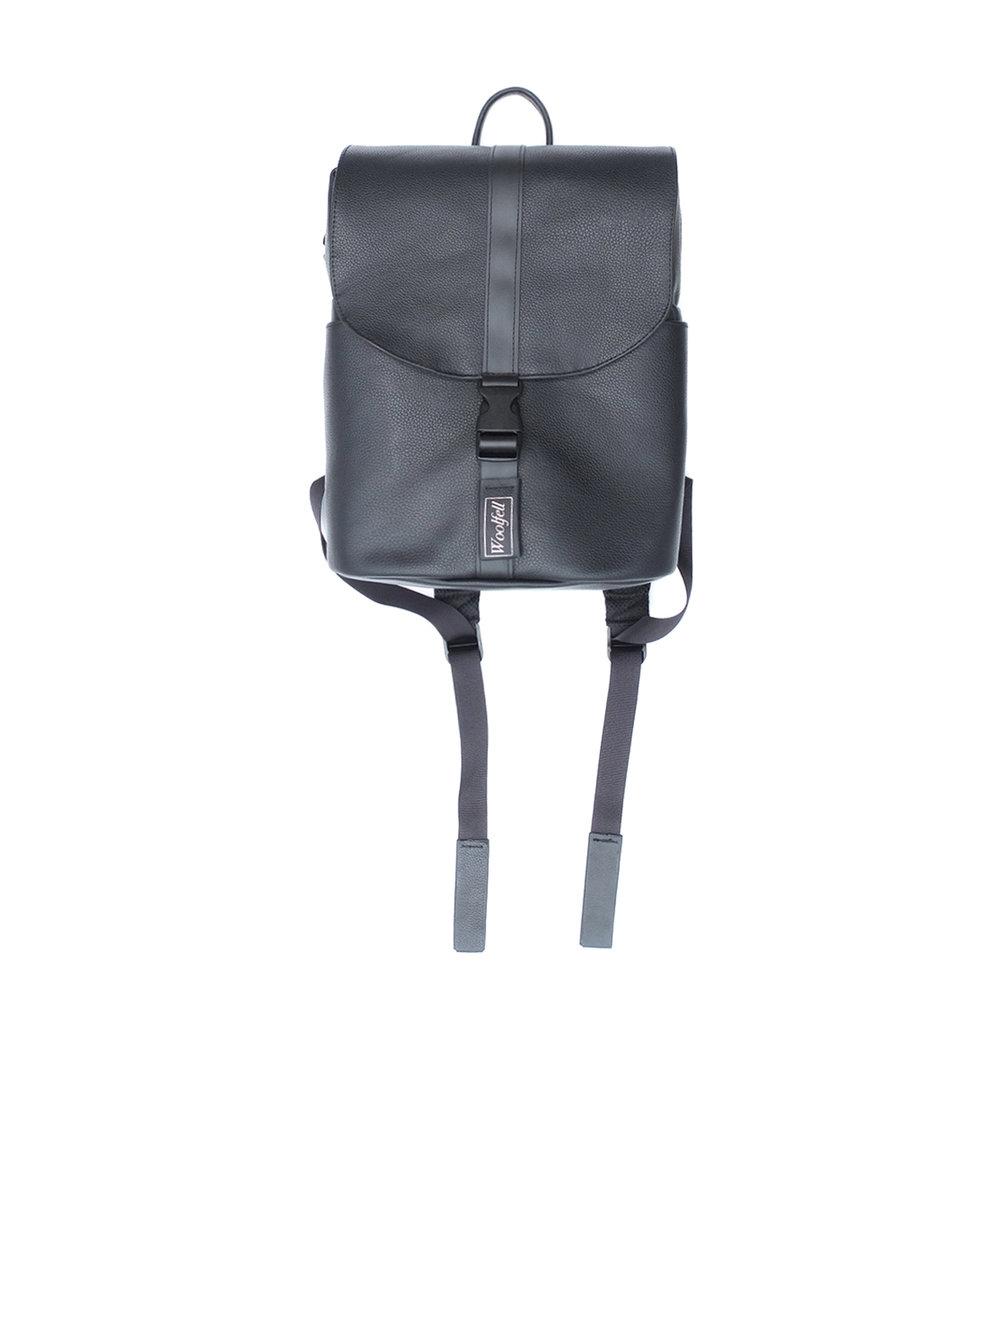 Fugato leather backpack - 280.00$